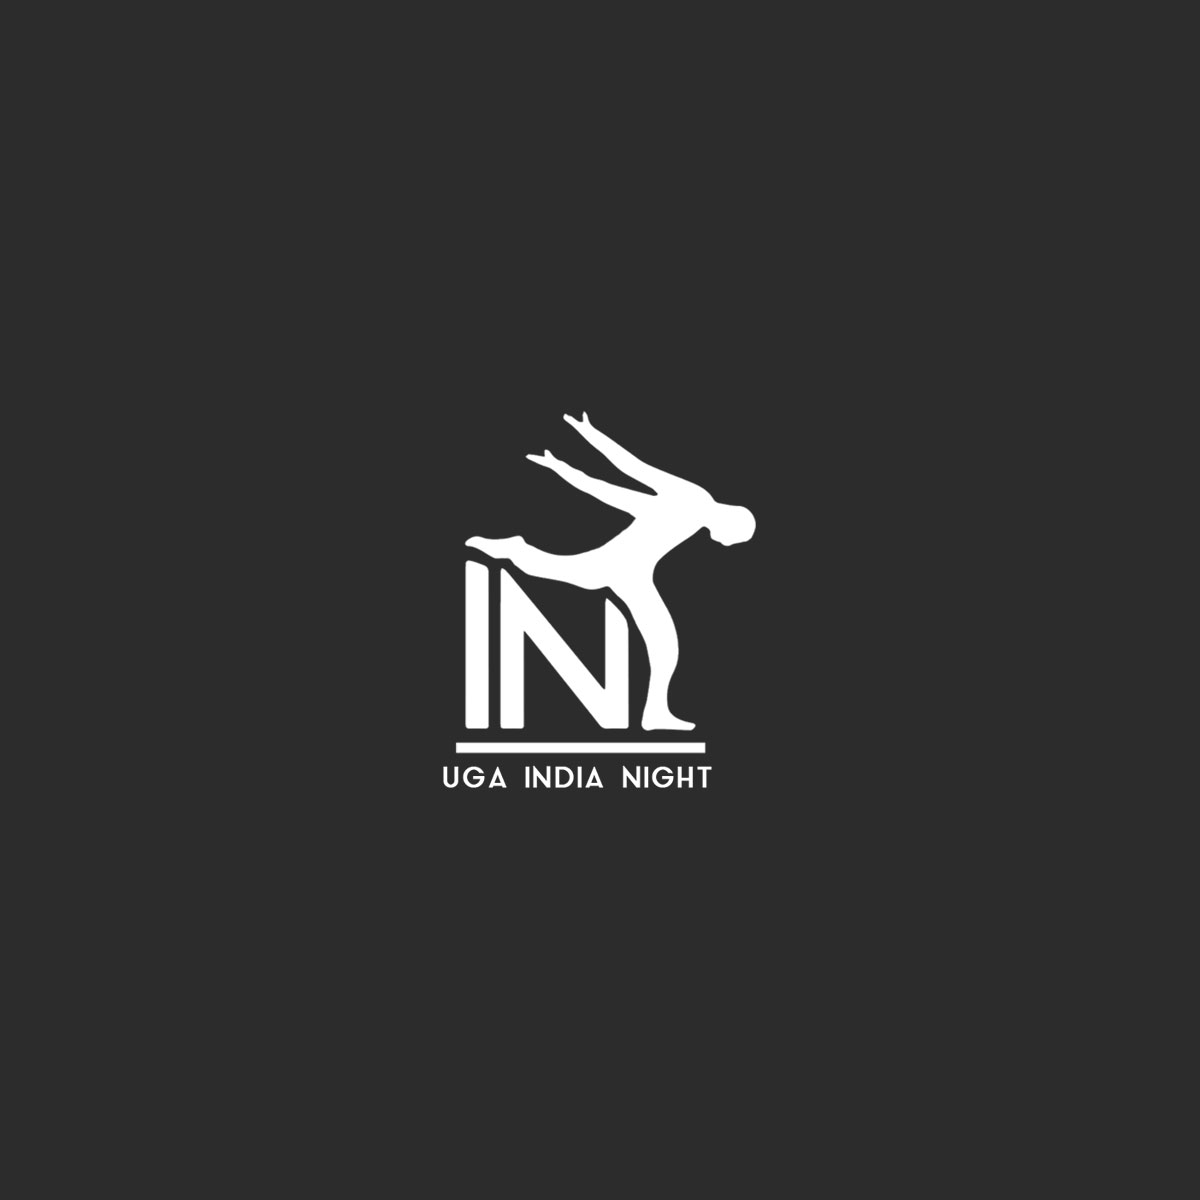 Portfolio-Logos-uin.jpg